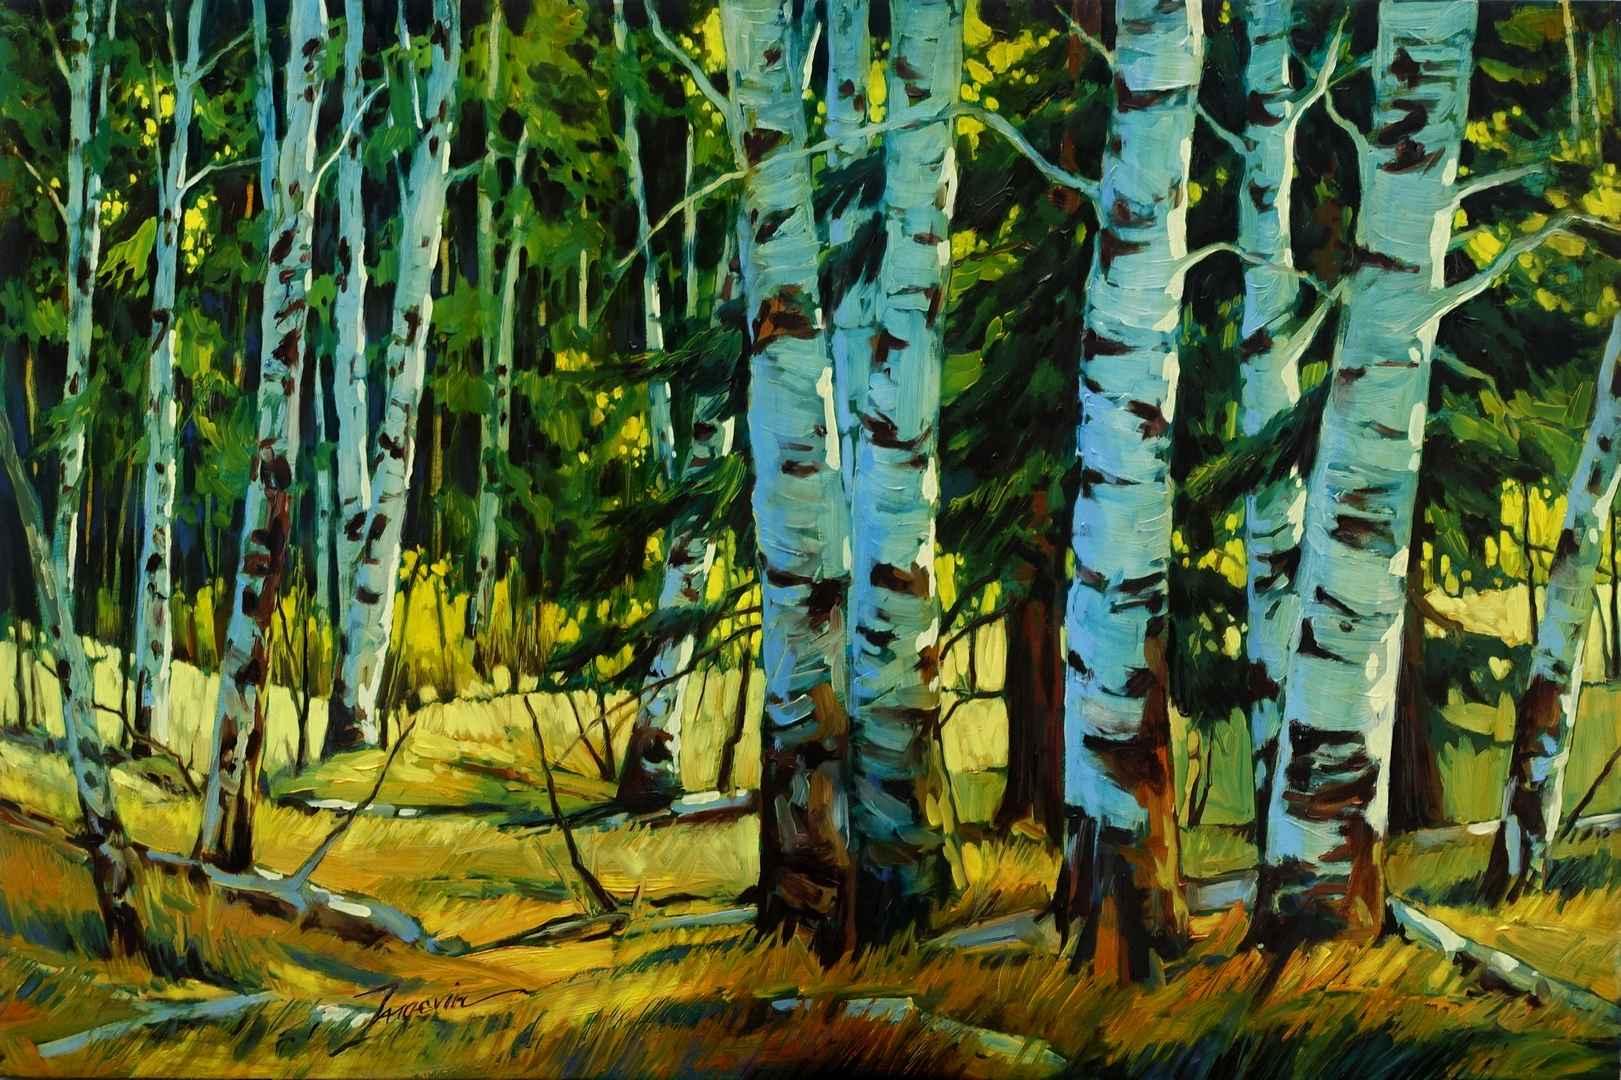 Aspens in the Way by  David Langevin - Masterpiece Online